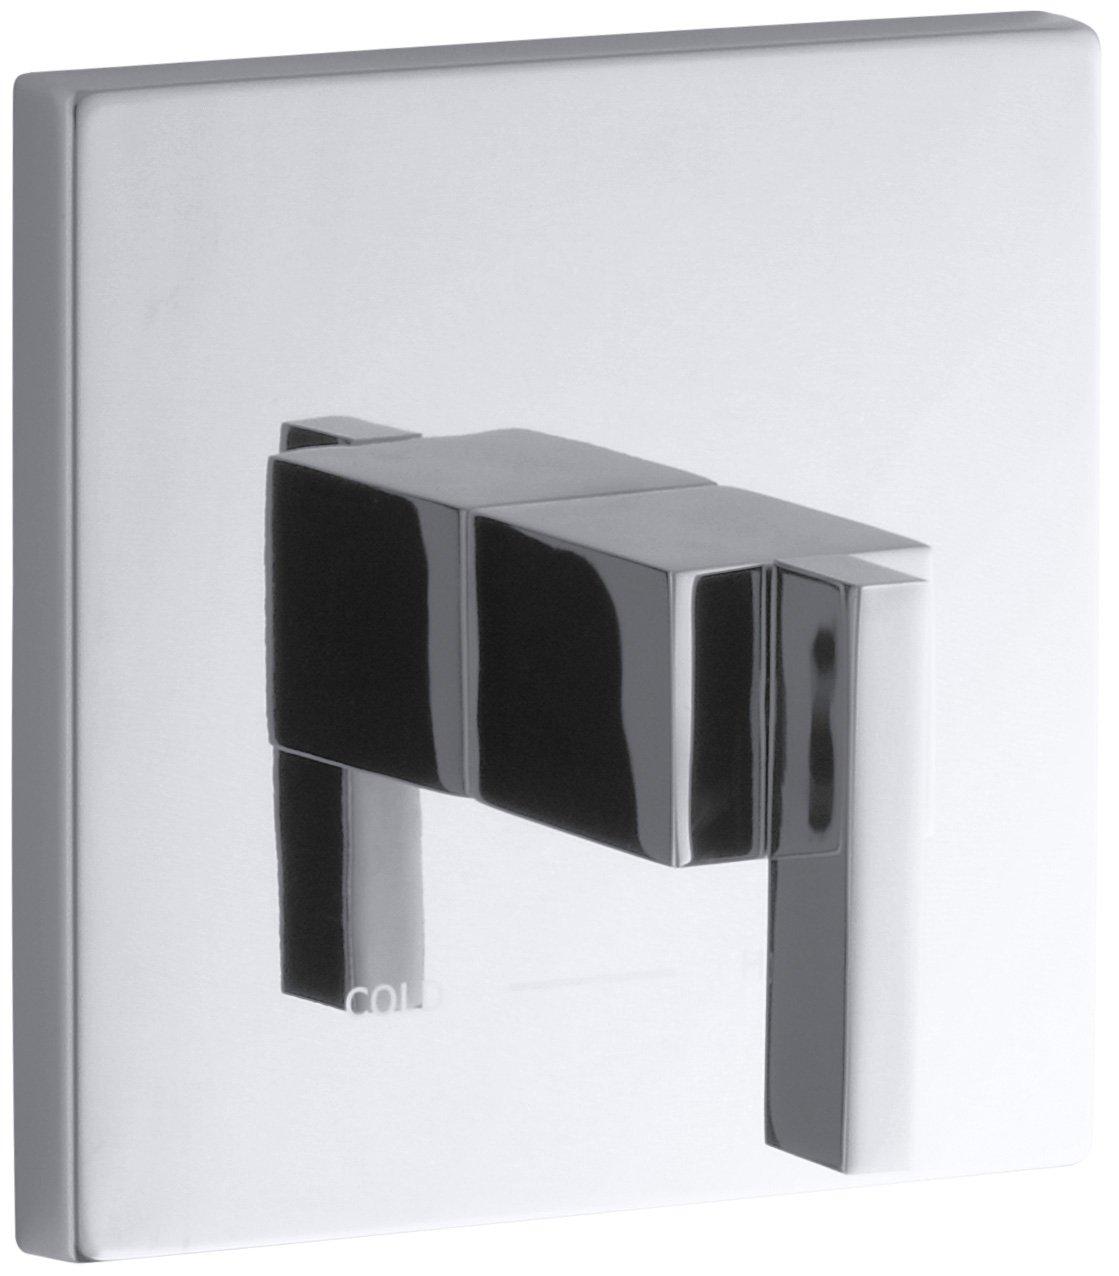 KOHLER K-T14672-4-CP Loure Thermostatic Valve Trim, Polished Chrome good